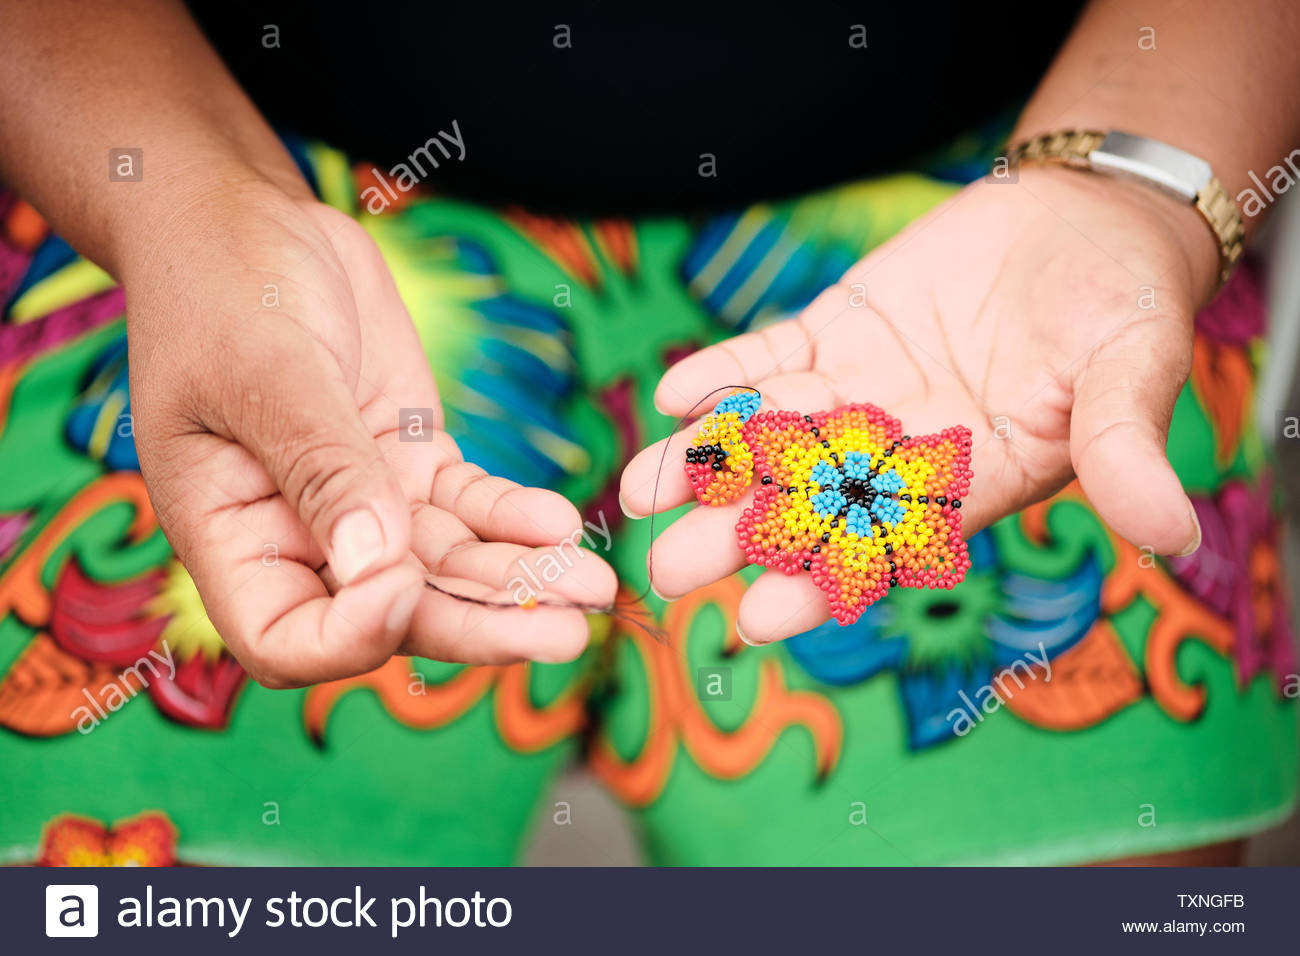 Indigenous woman beading flower coaster, Ciudad de Panamá, Panama - Stock Image